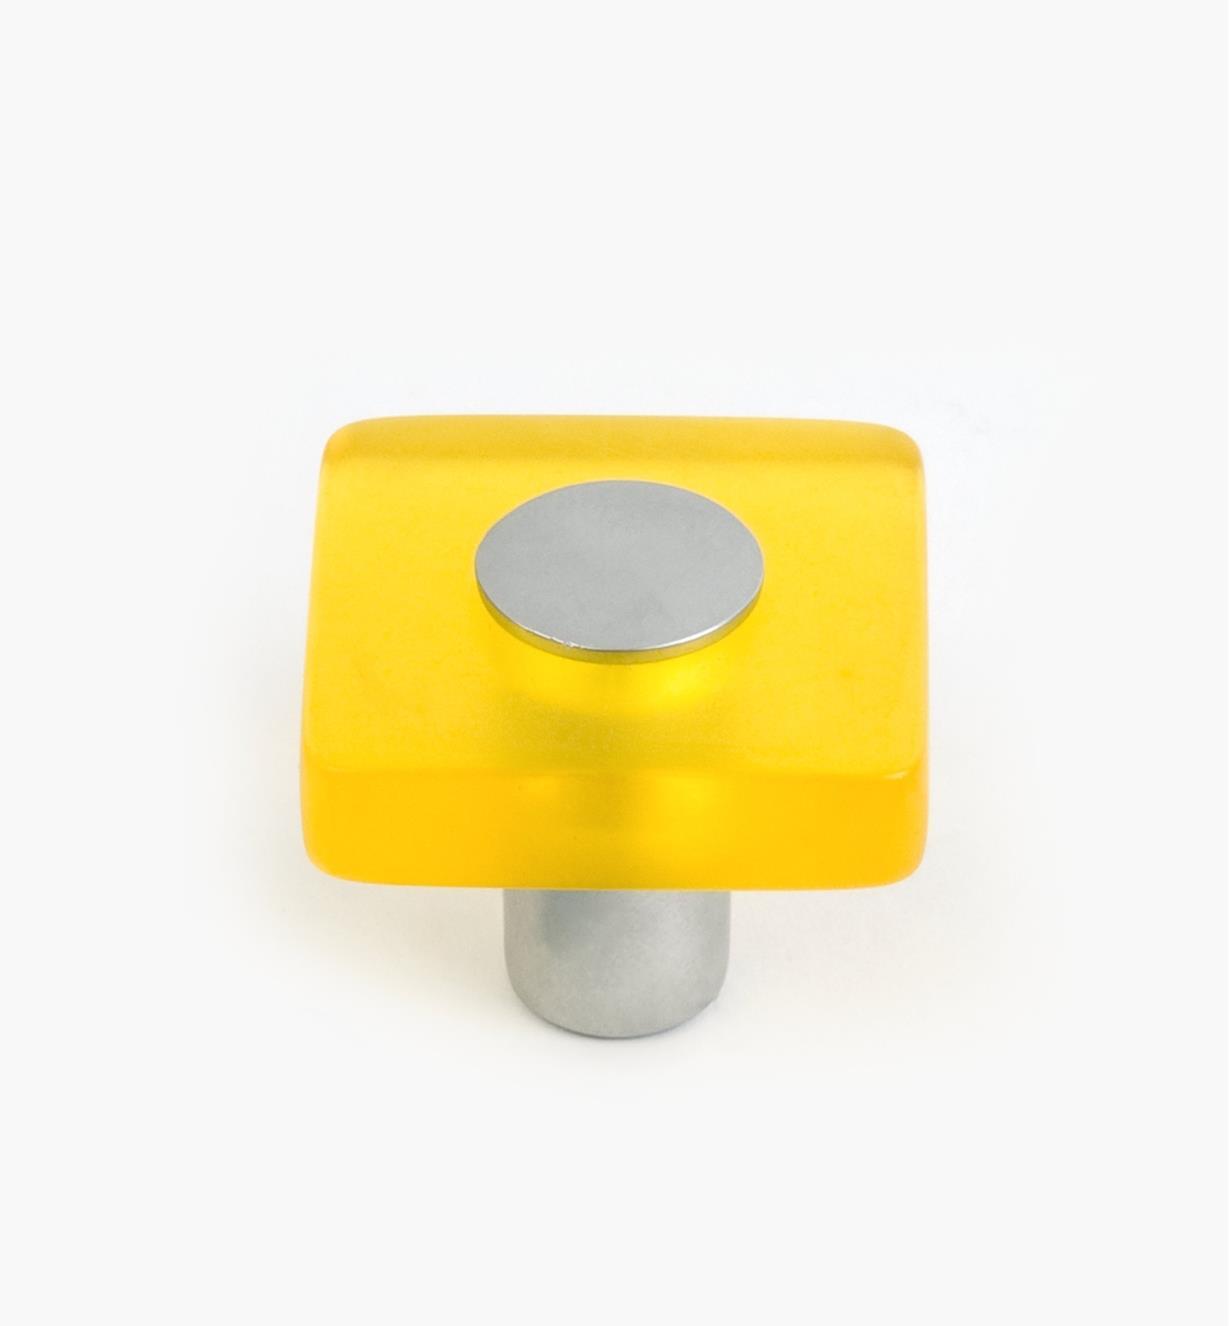 01W1180 - Bouton carré Malaga, jaune, 30 mm x 25 mm